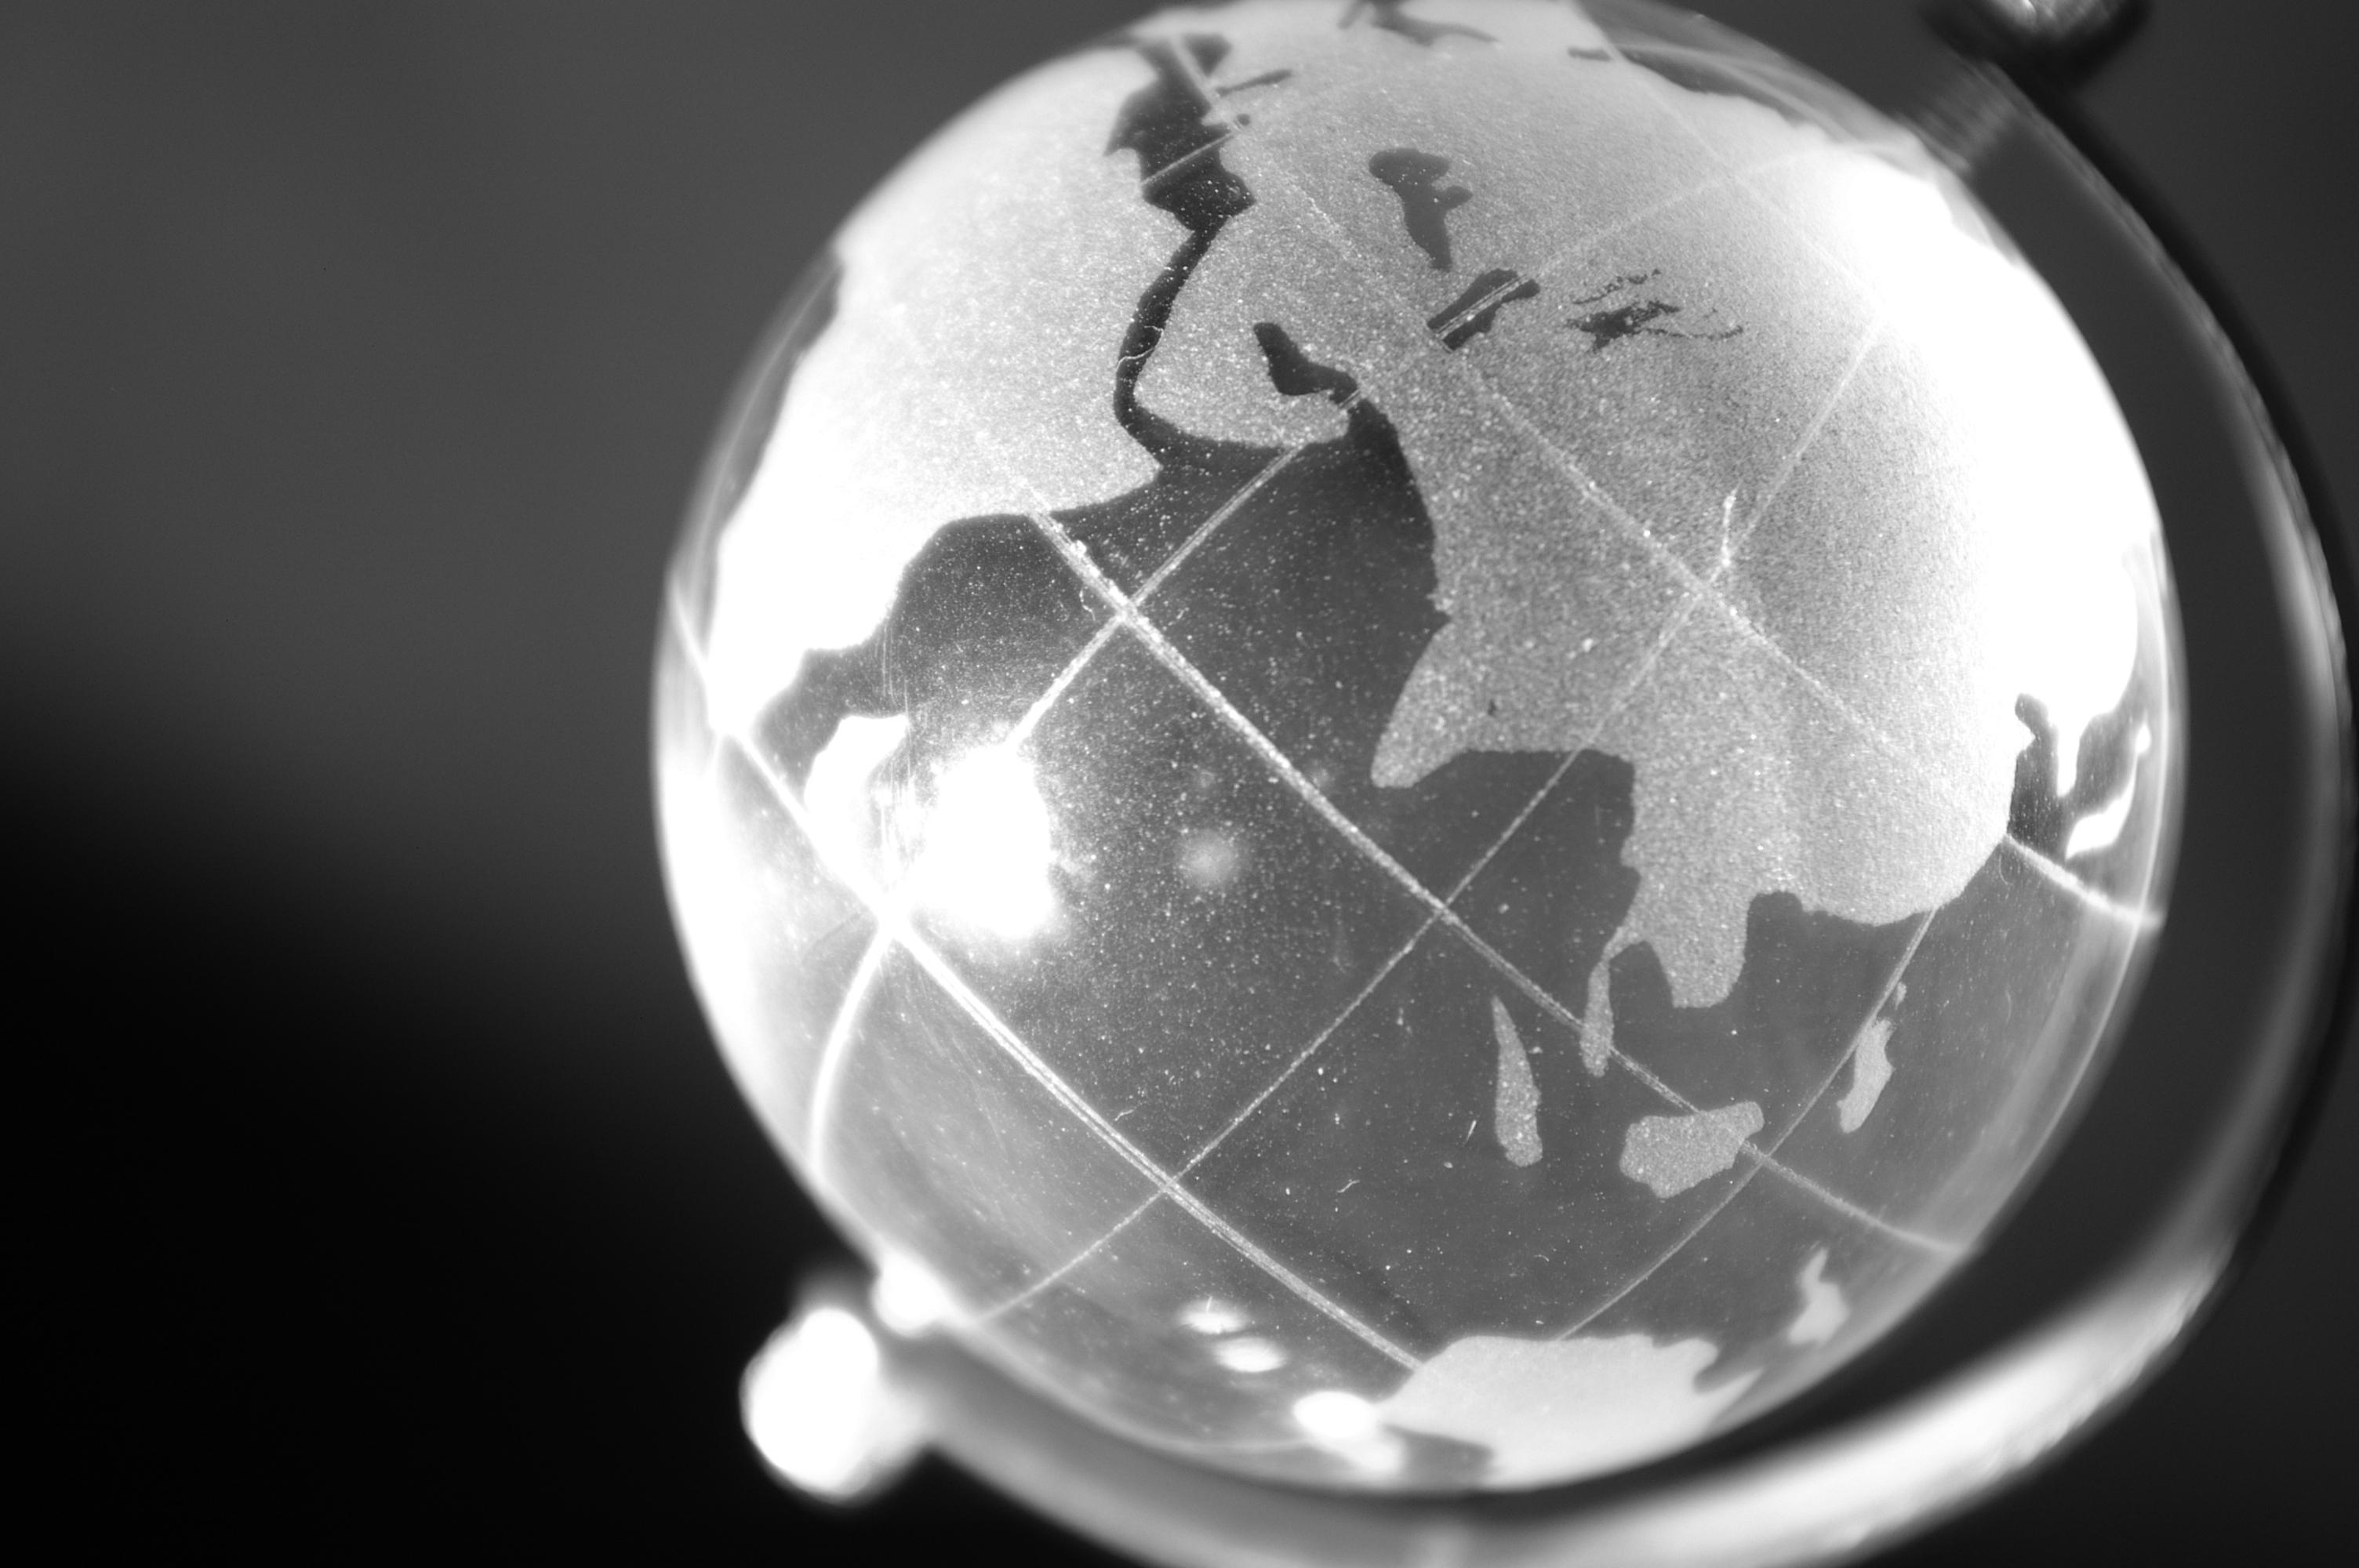 Black and white globe photo